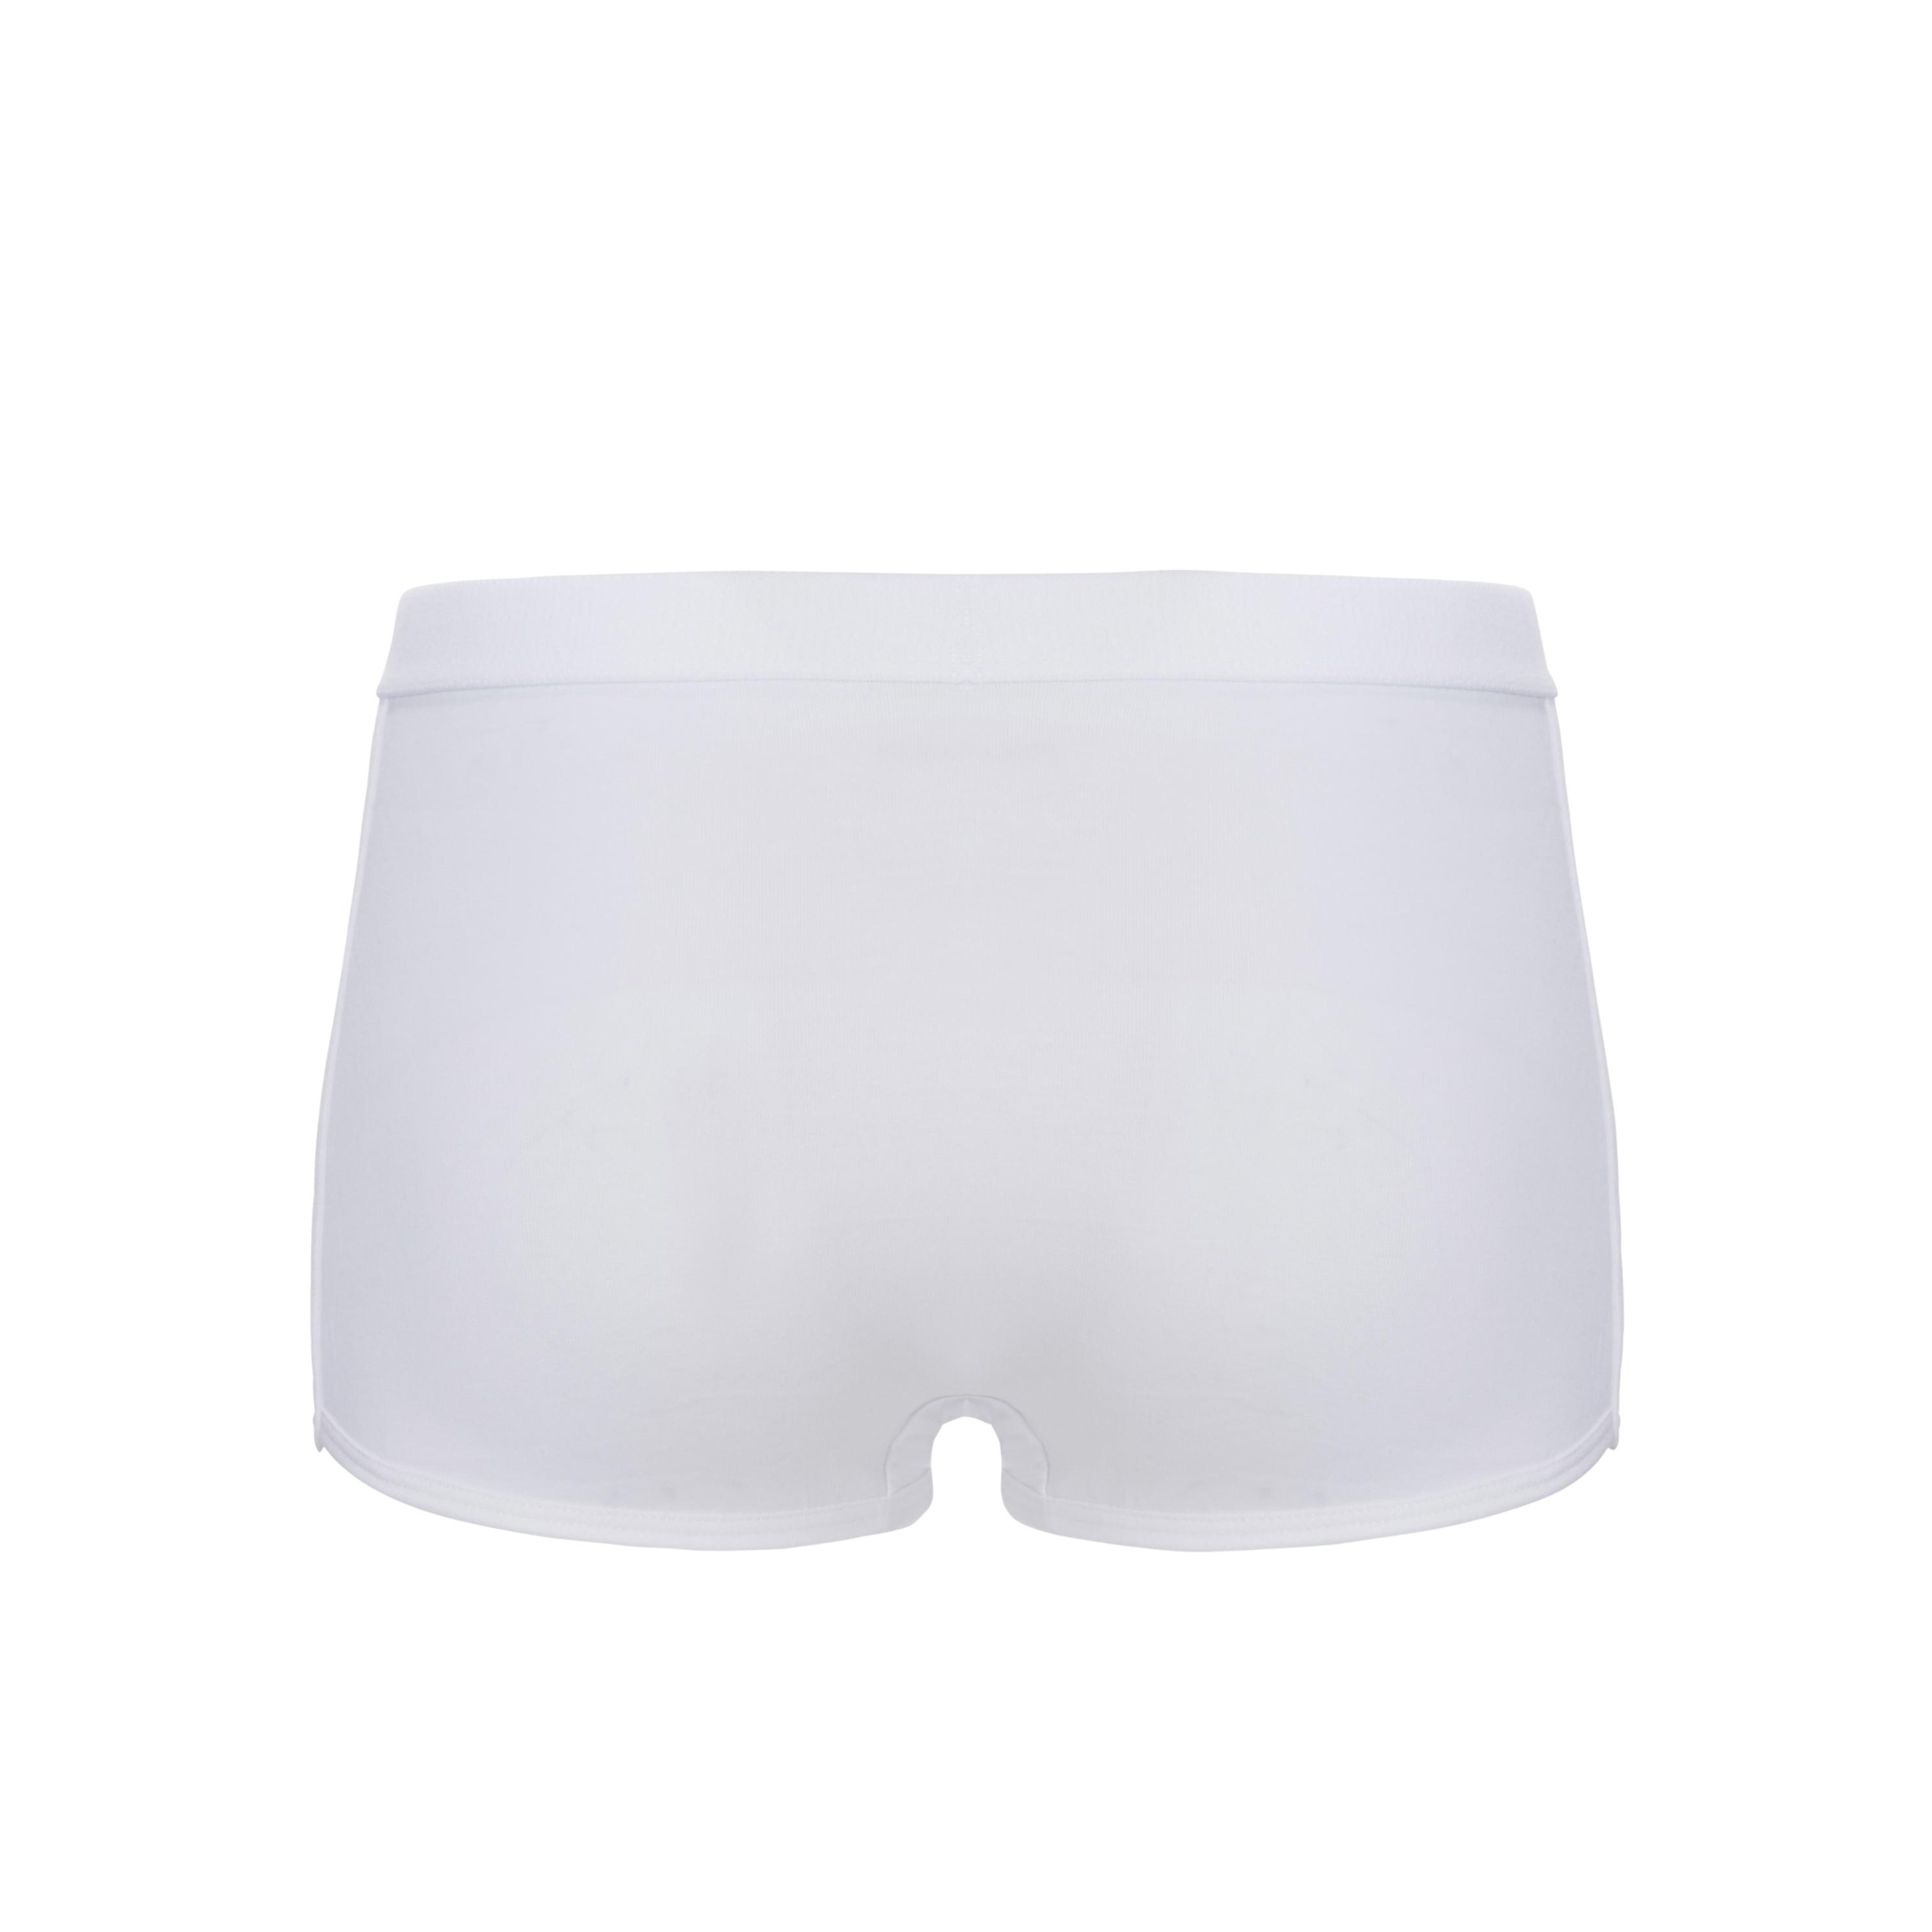 Ten cate basic short in 2-pack wit, zwart, aqua